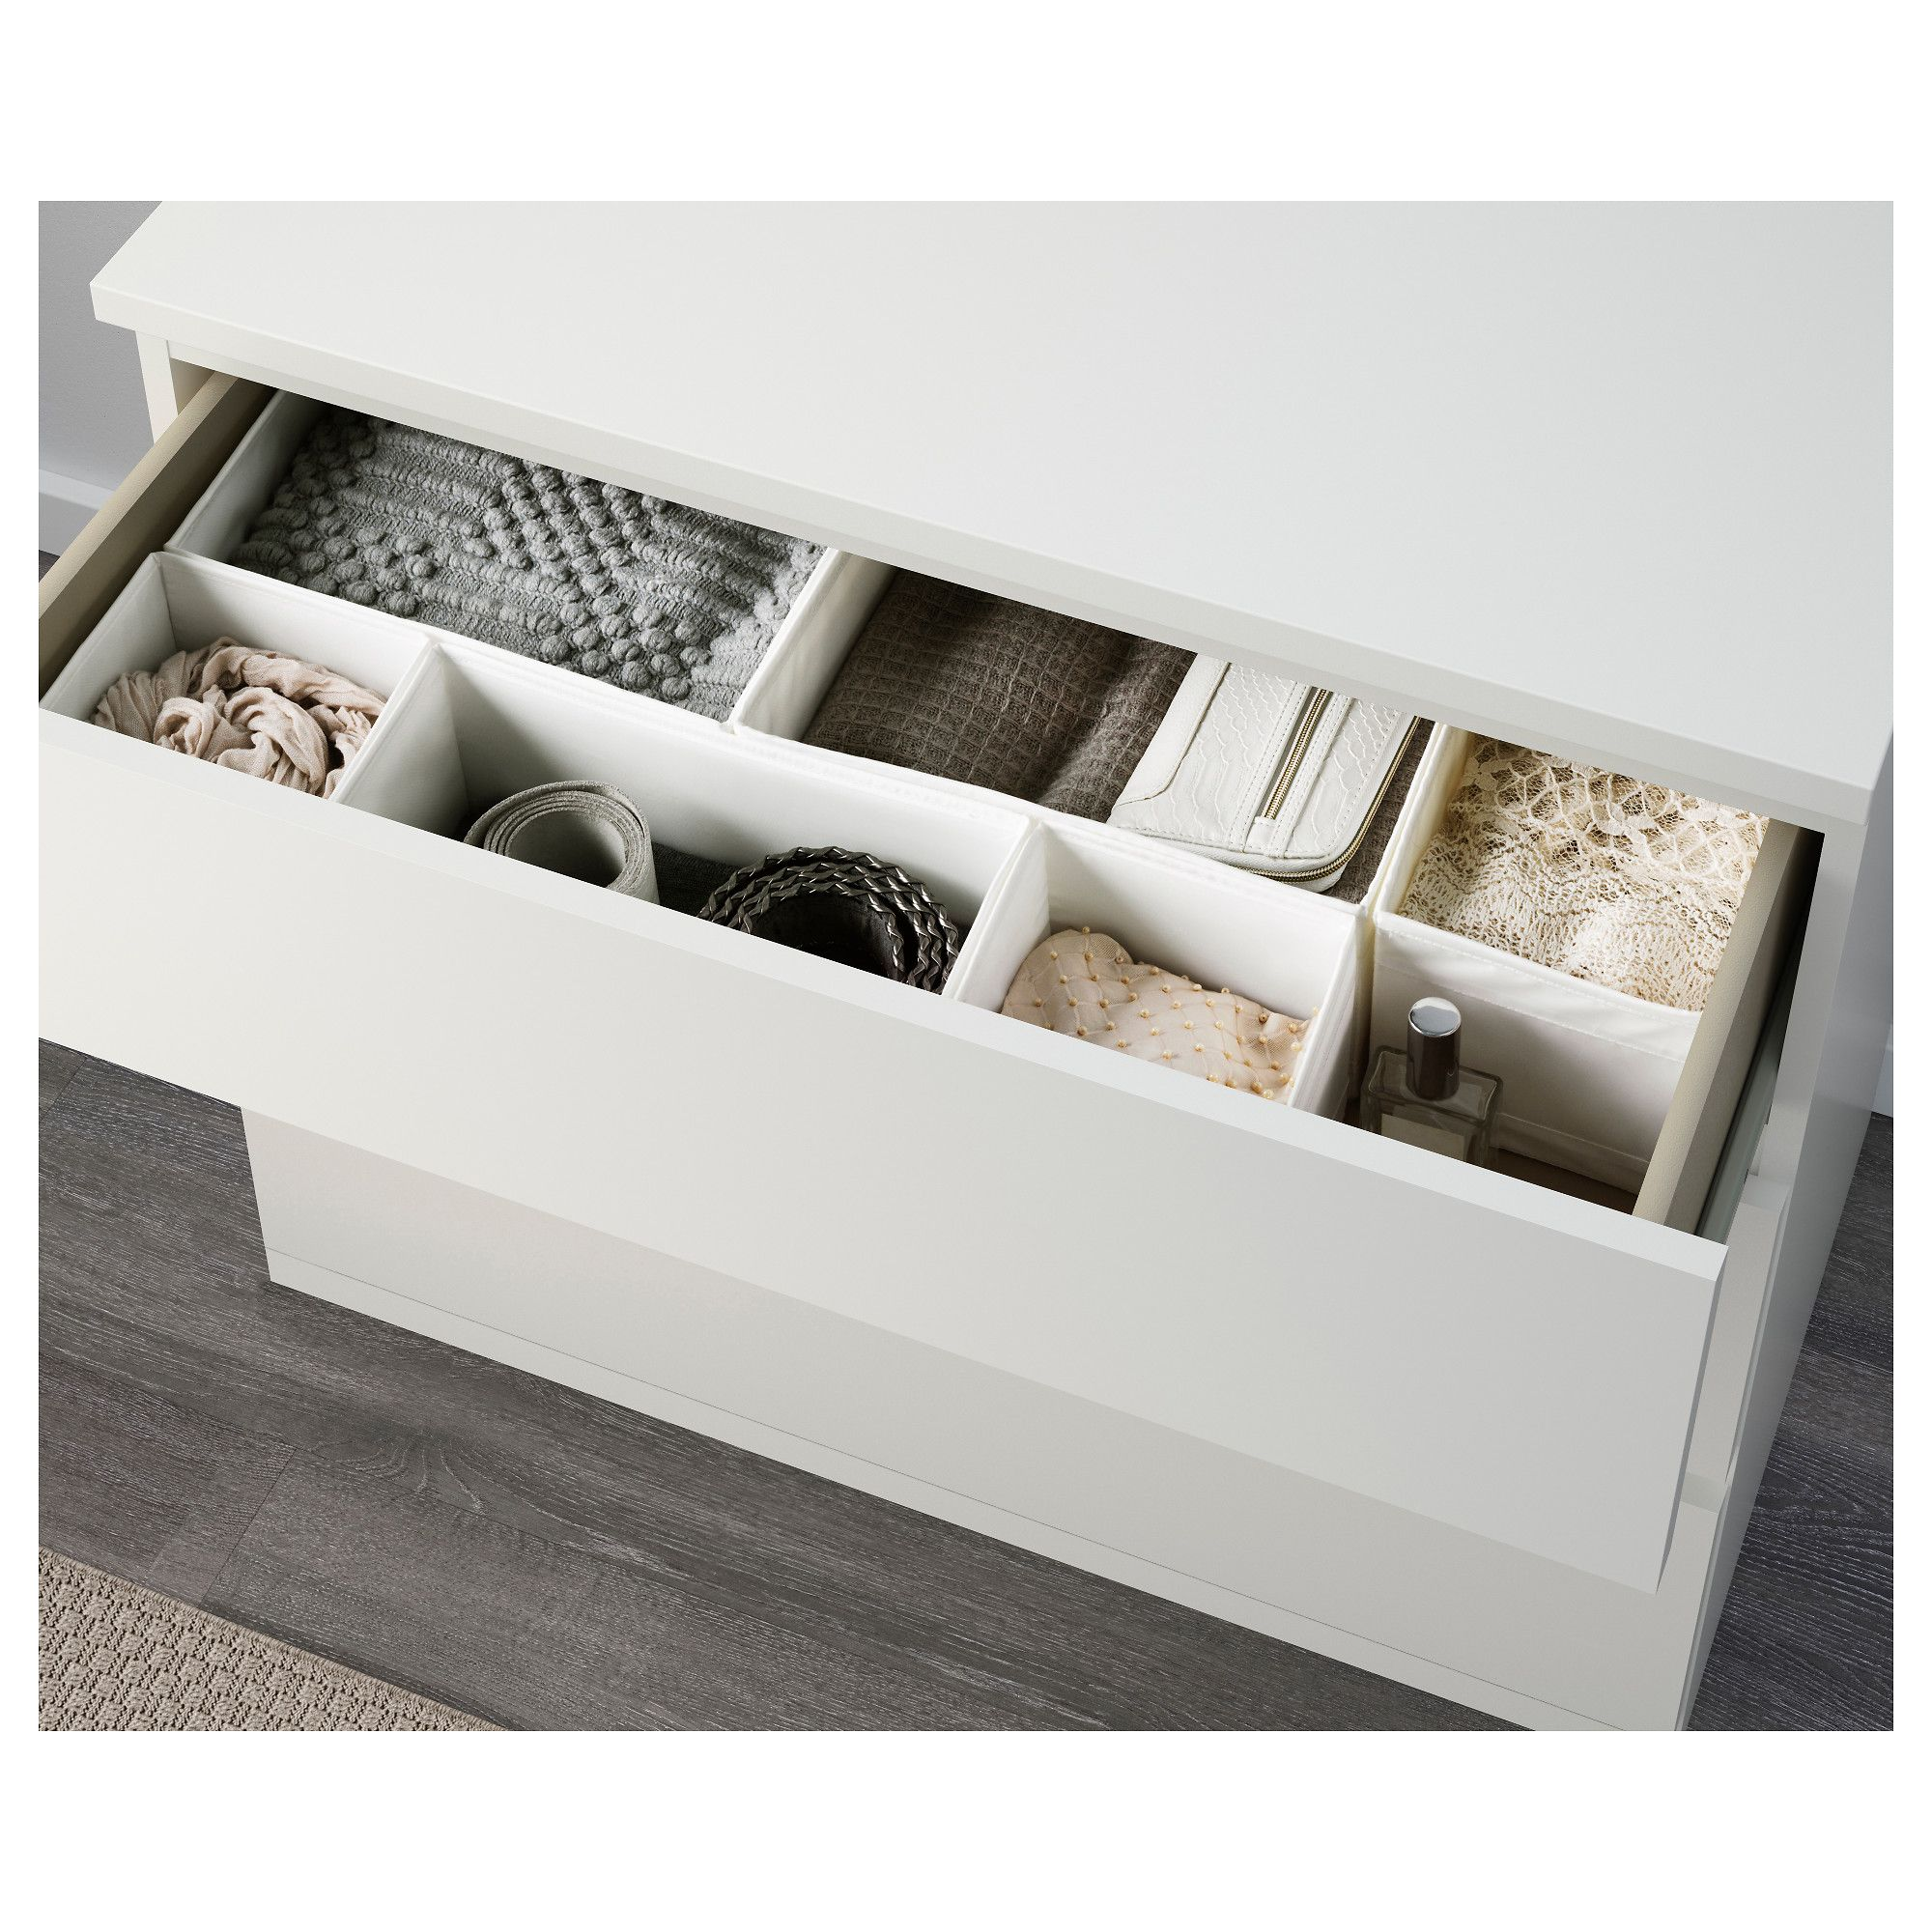 Malm Ladekast Ikea 3 Laden.Ikea Malm 3 Drawer Chest White Closet Organization Malm